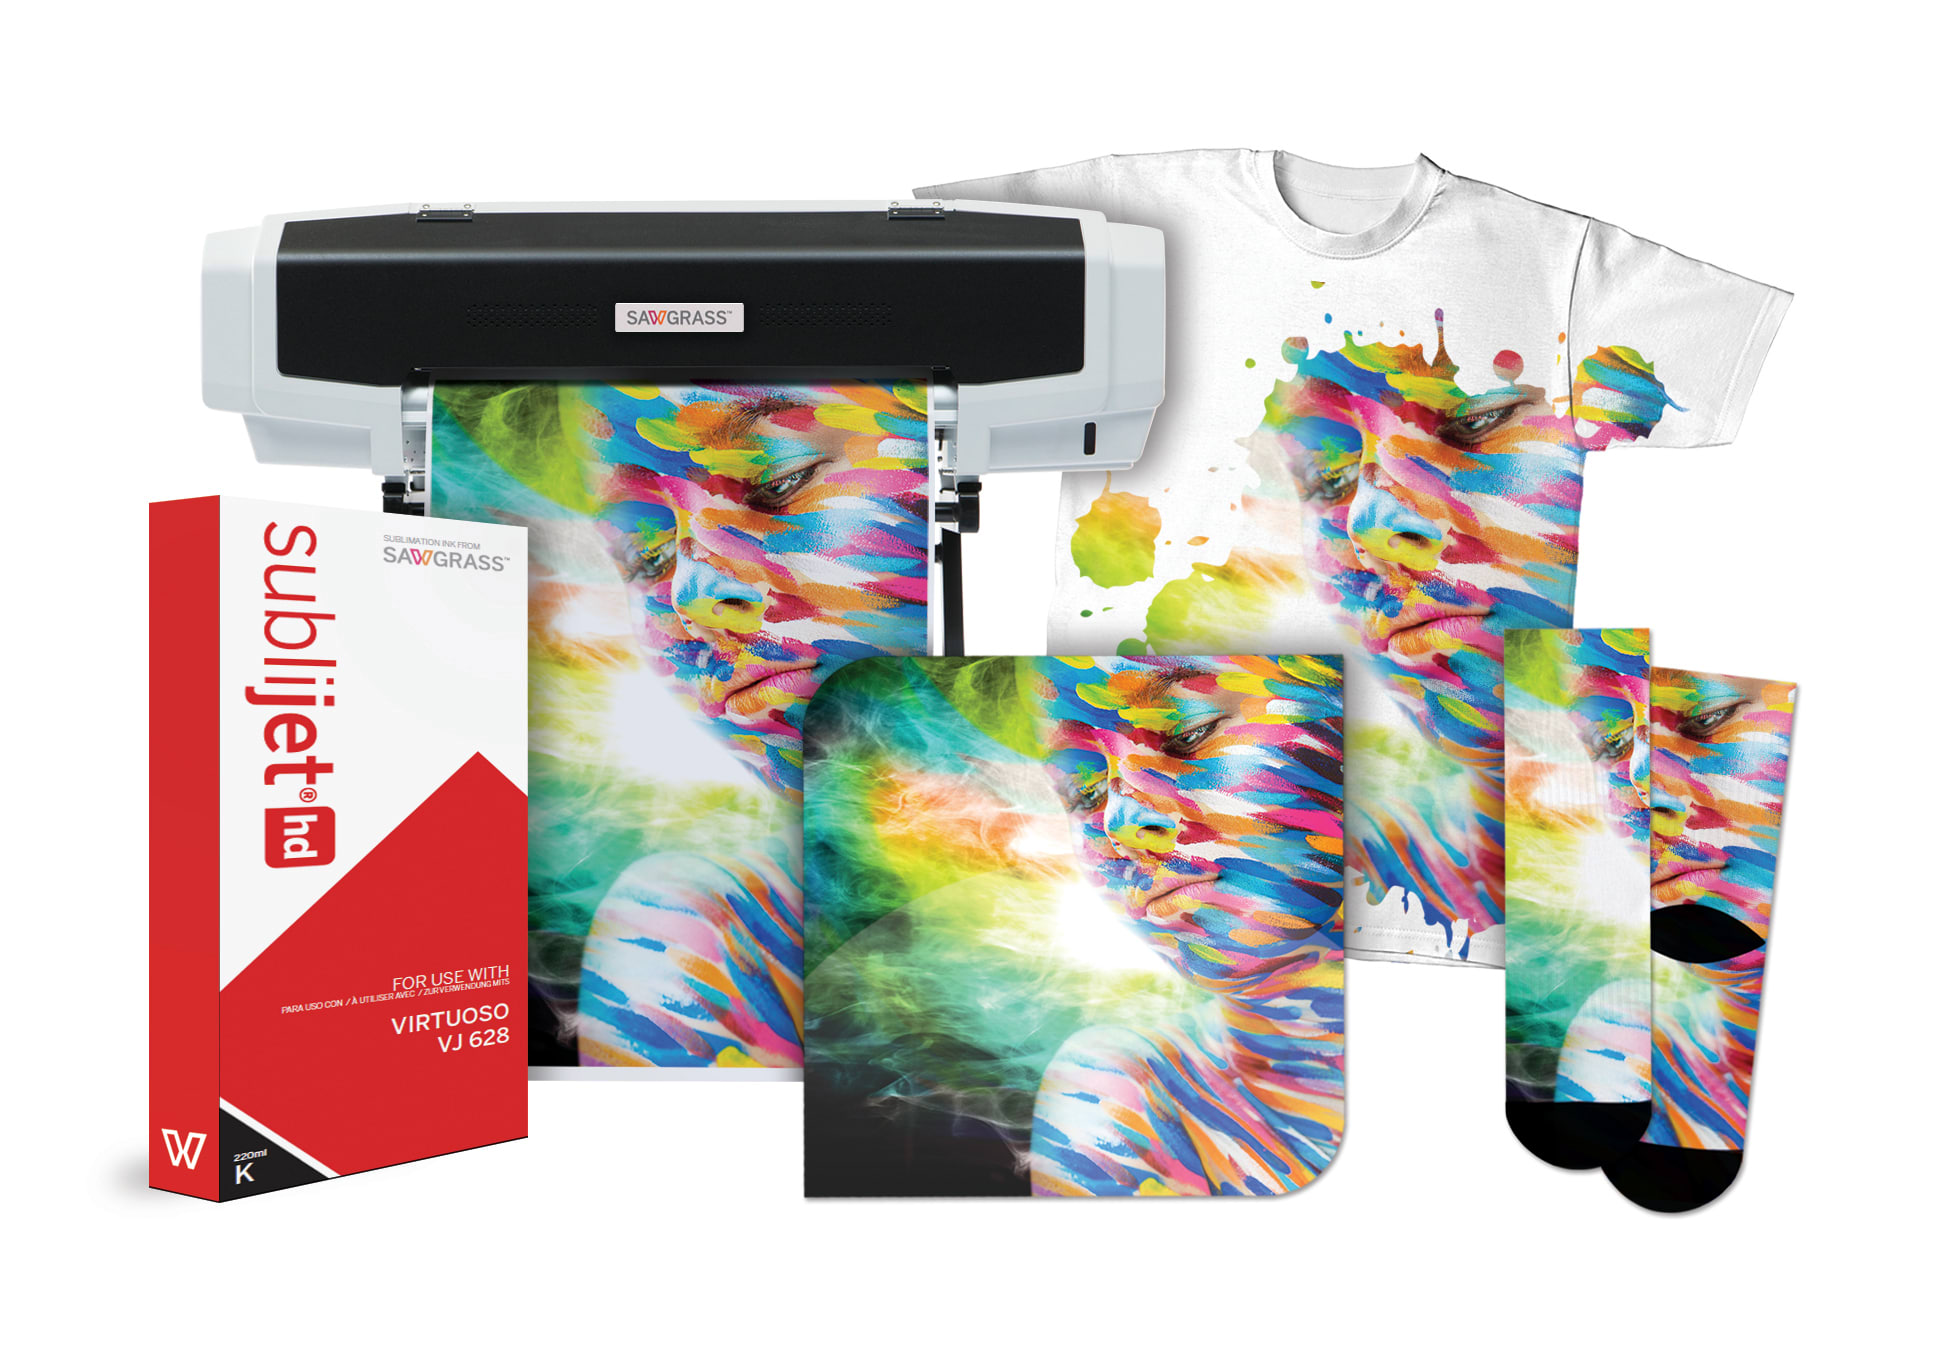 New Virtuoso VJ628 High-Definition Dye Sublimation Printer